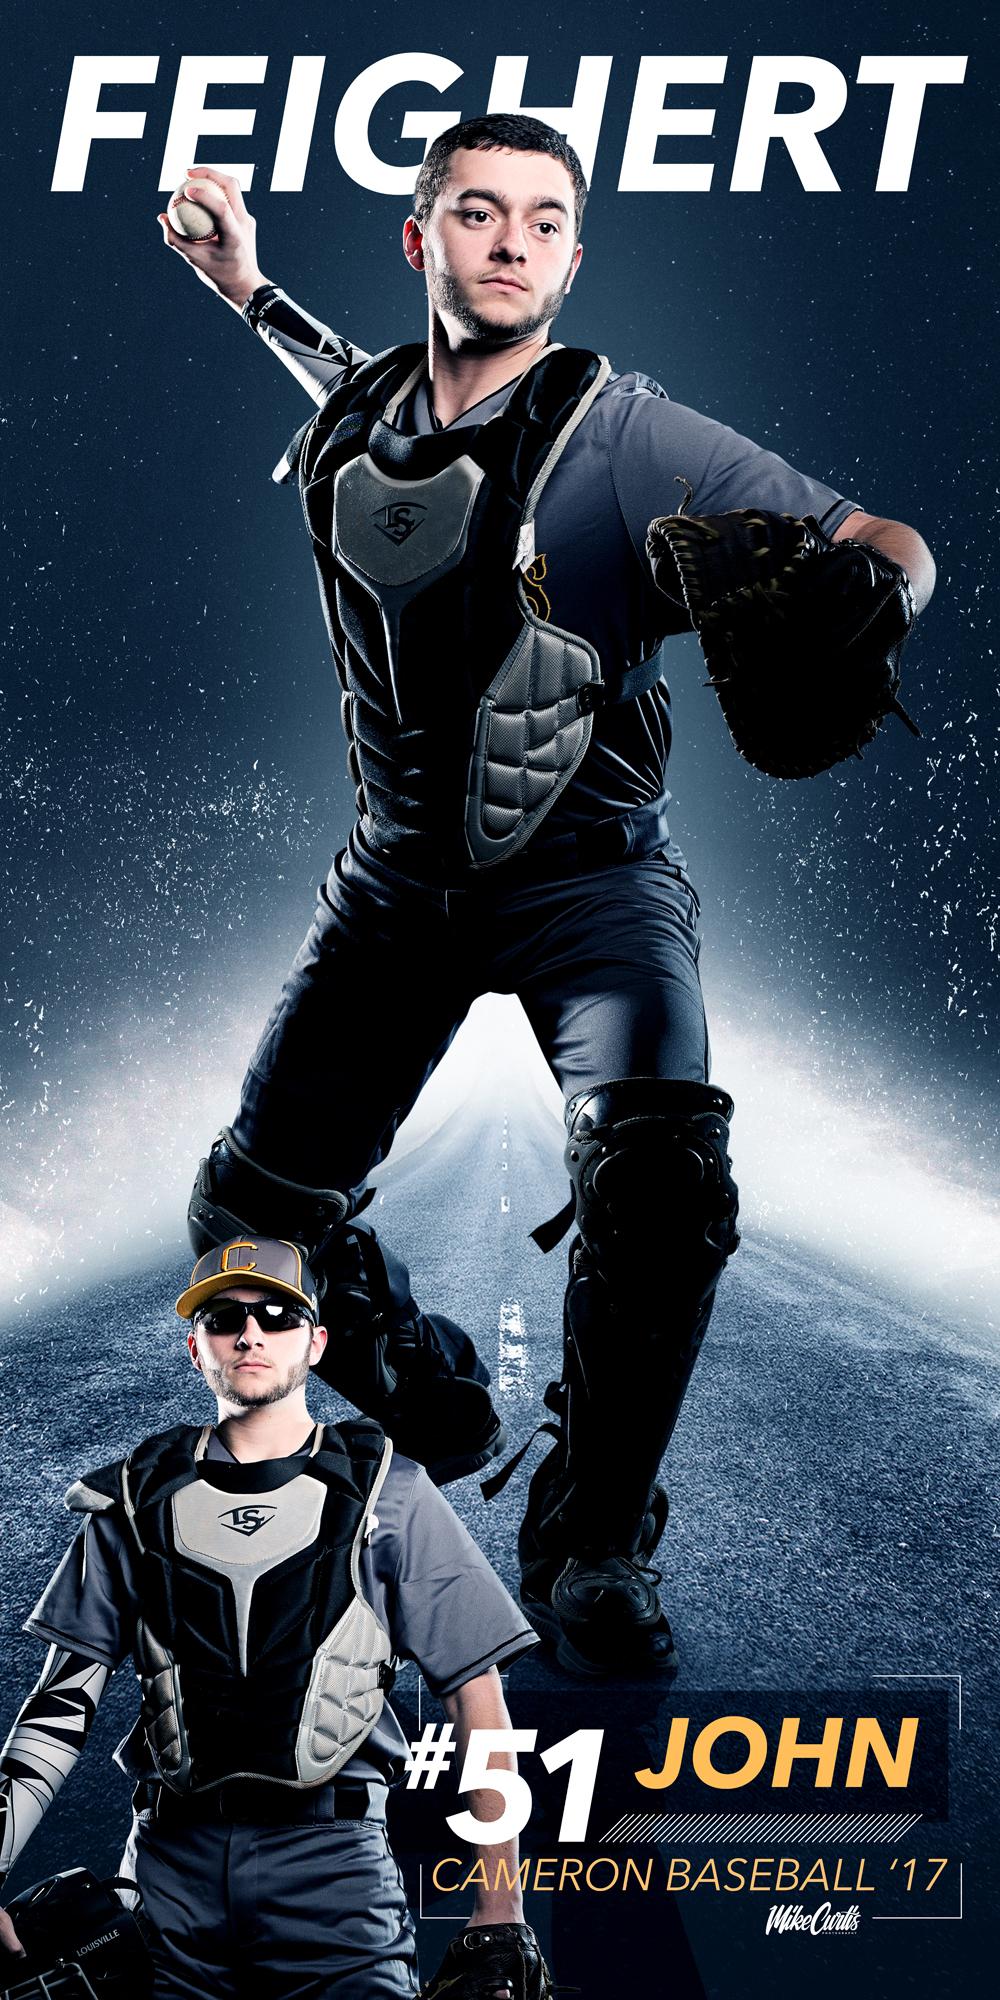 CHS-Baseball-17_Feighert_2x4-Banner.jpg